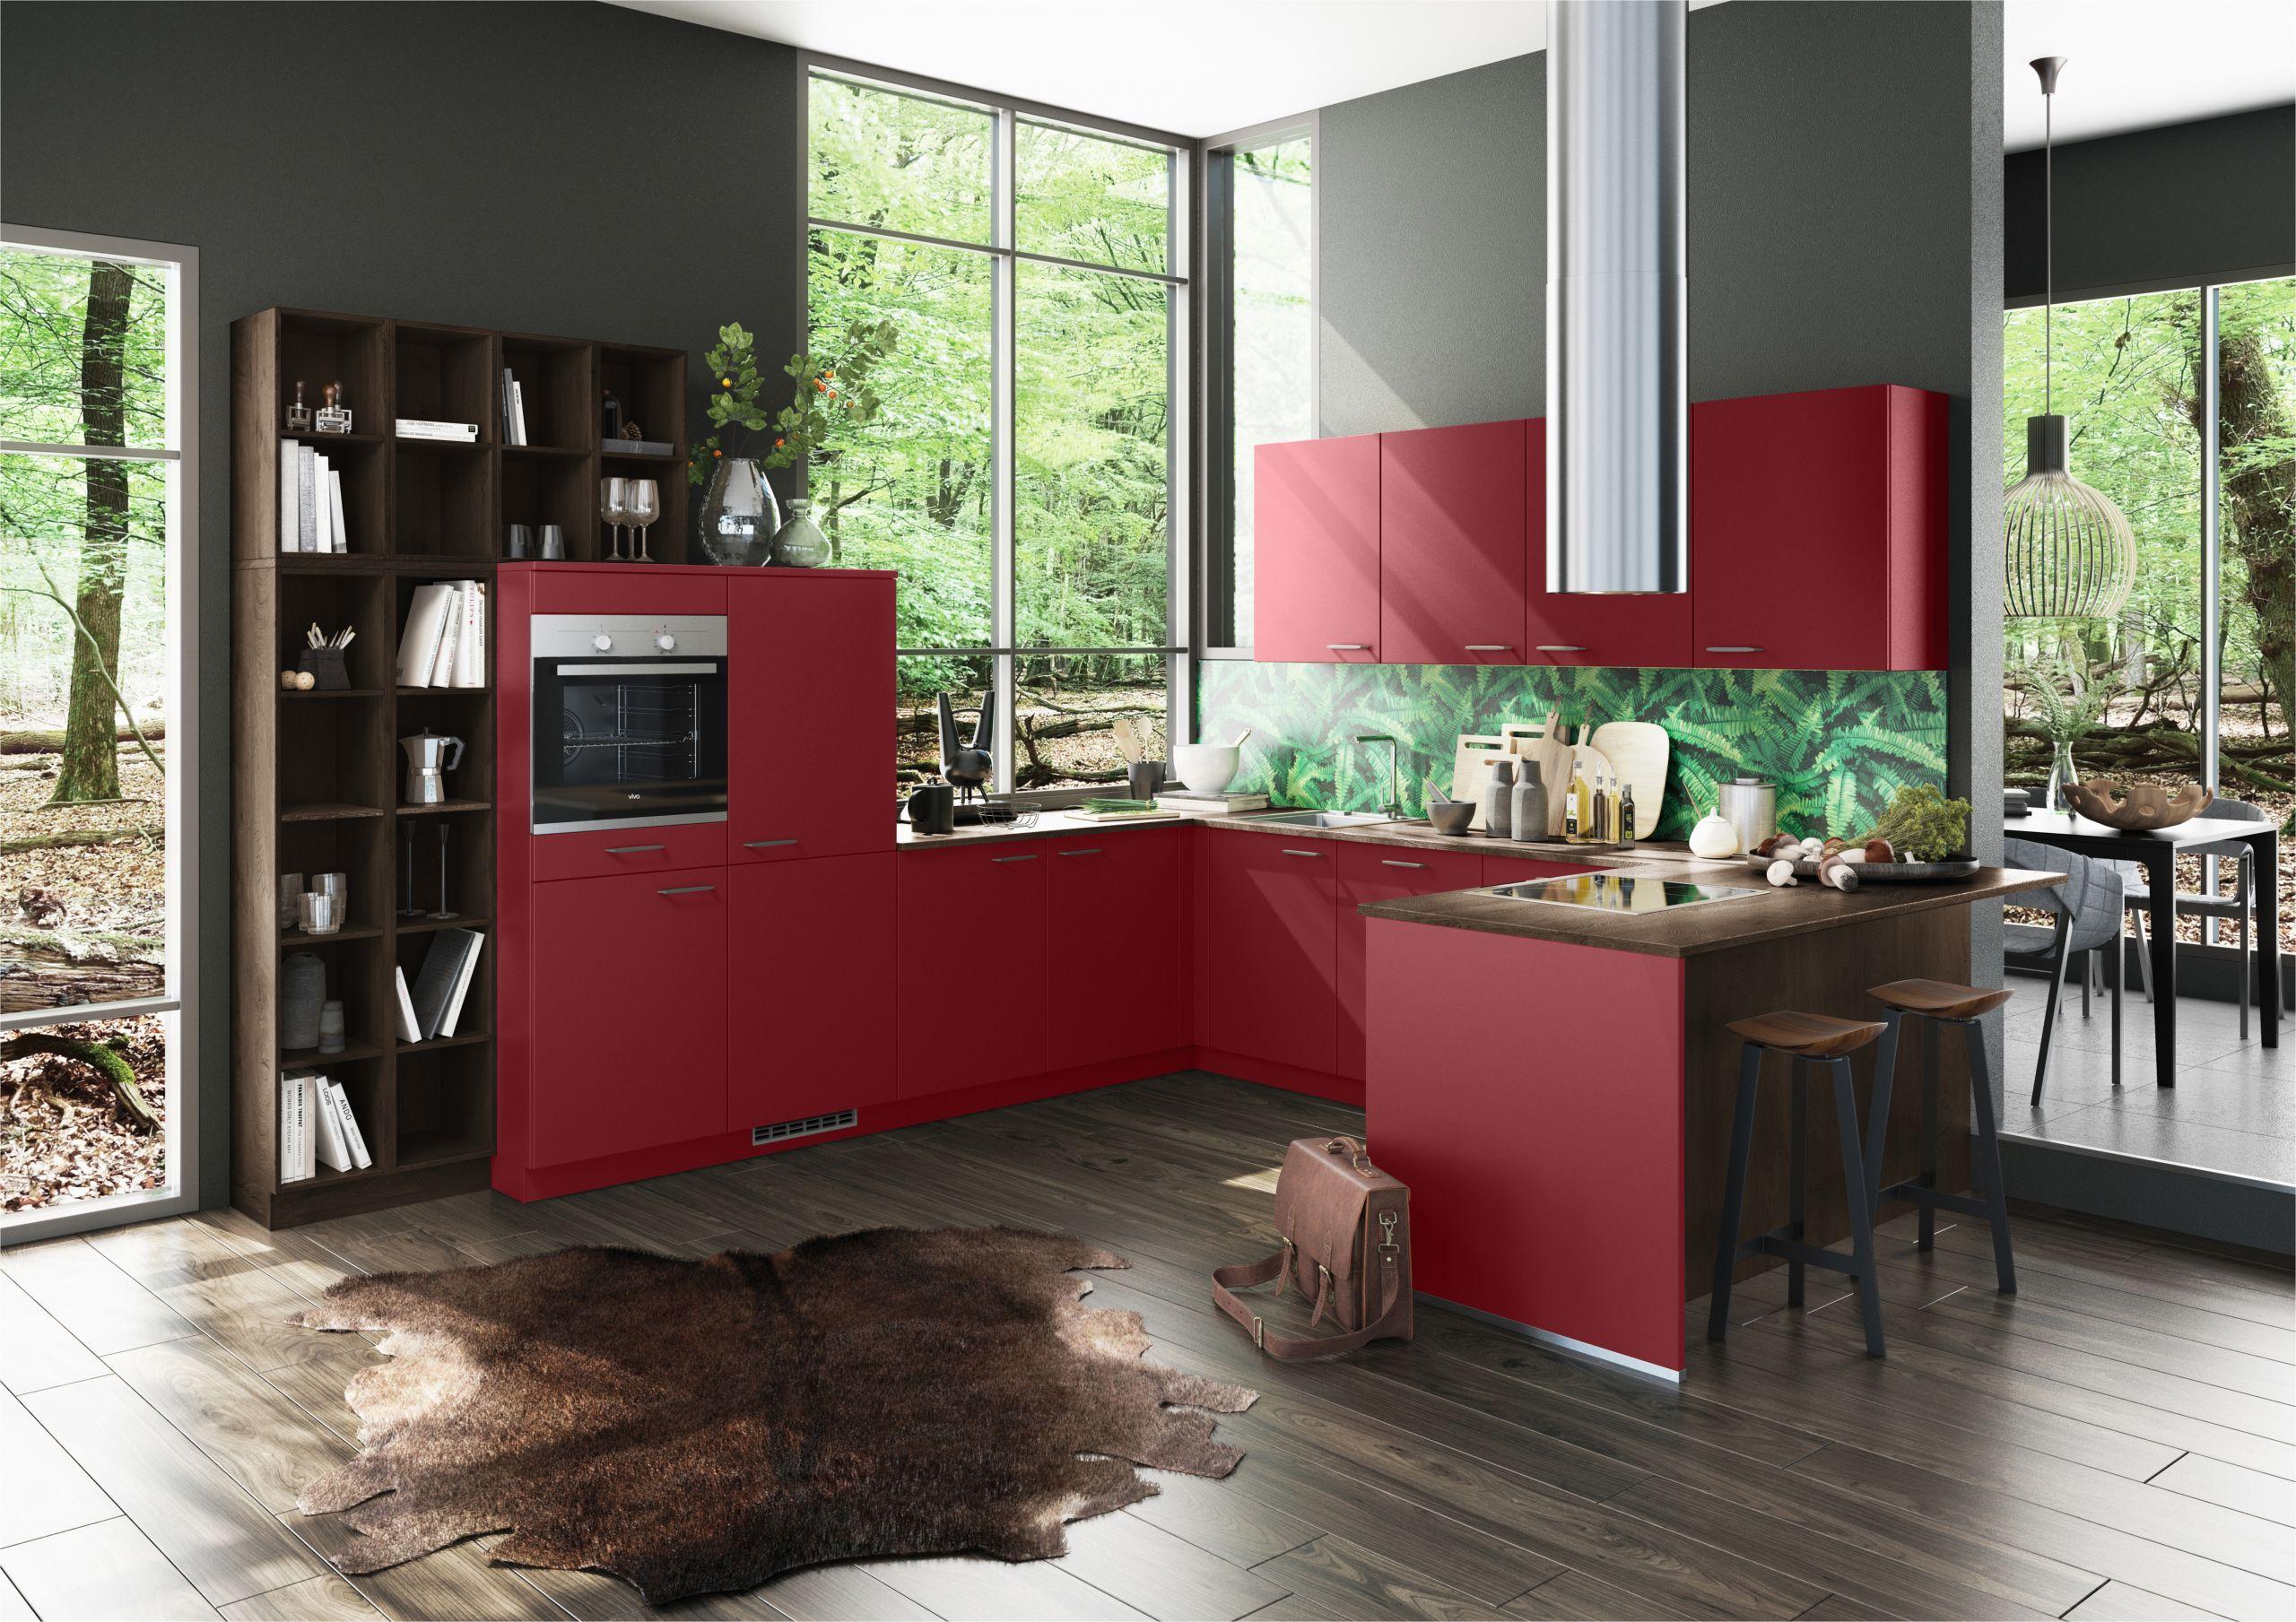 kuchen grau holz mit rote kuchen kuchentrends in rot kuche co 75 und forest 491 491 109 mit kuchen grau holz